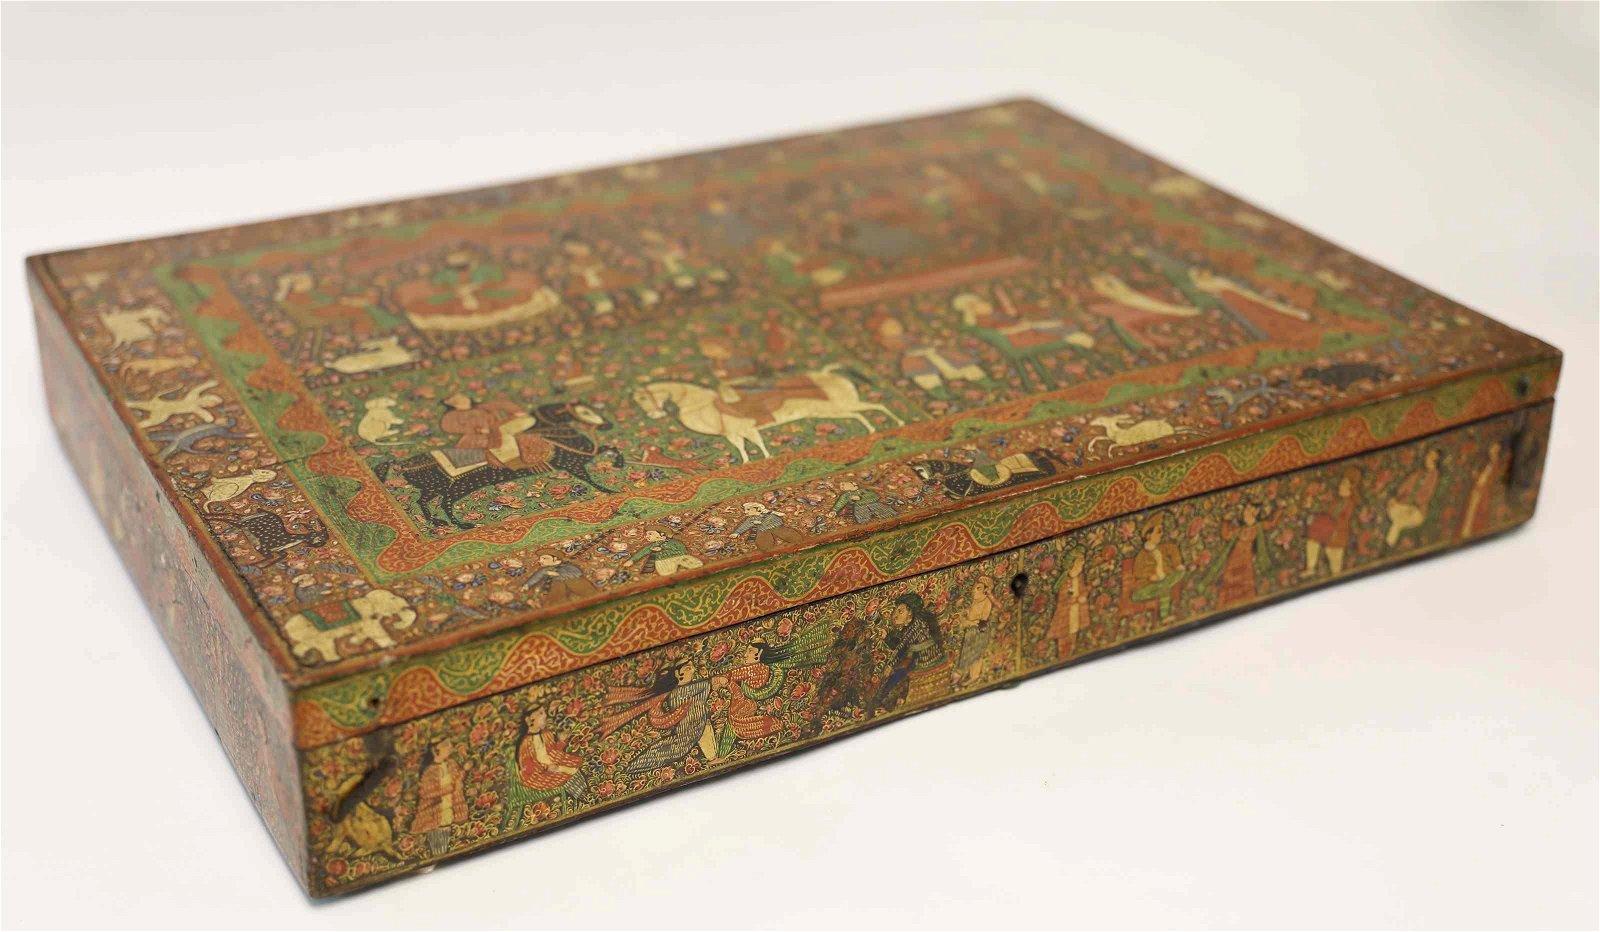 18c Persian Mughal Polychrome Famille & Animal Box